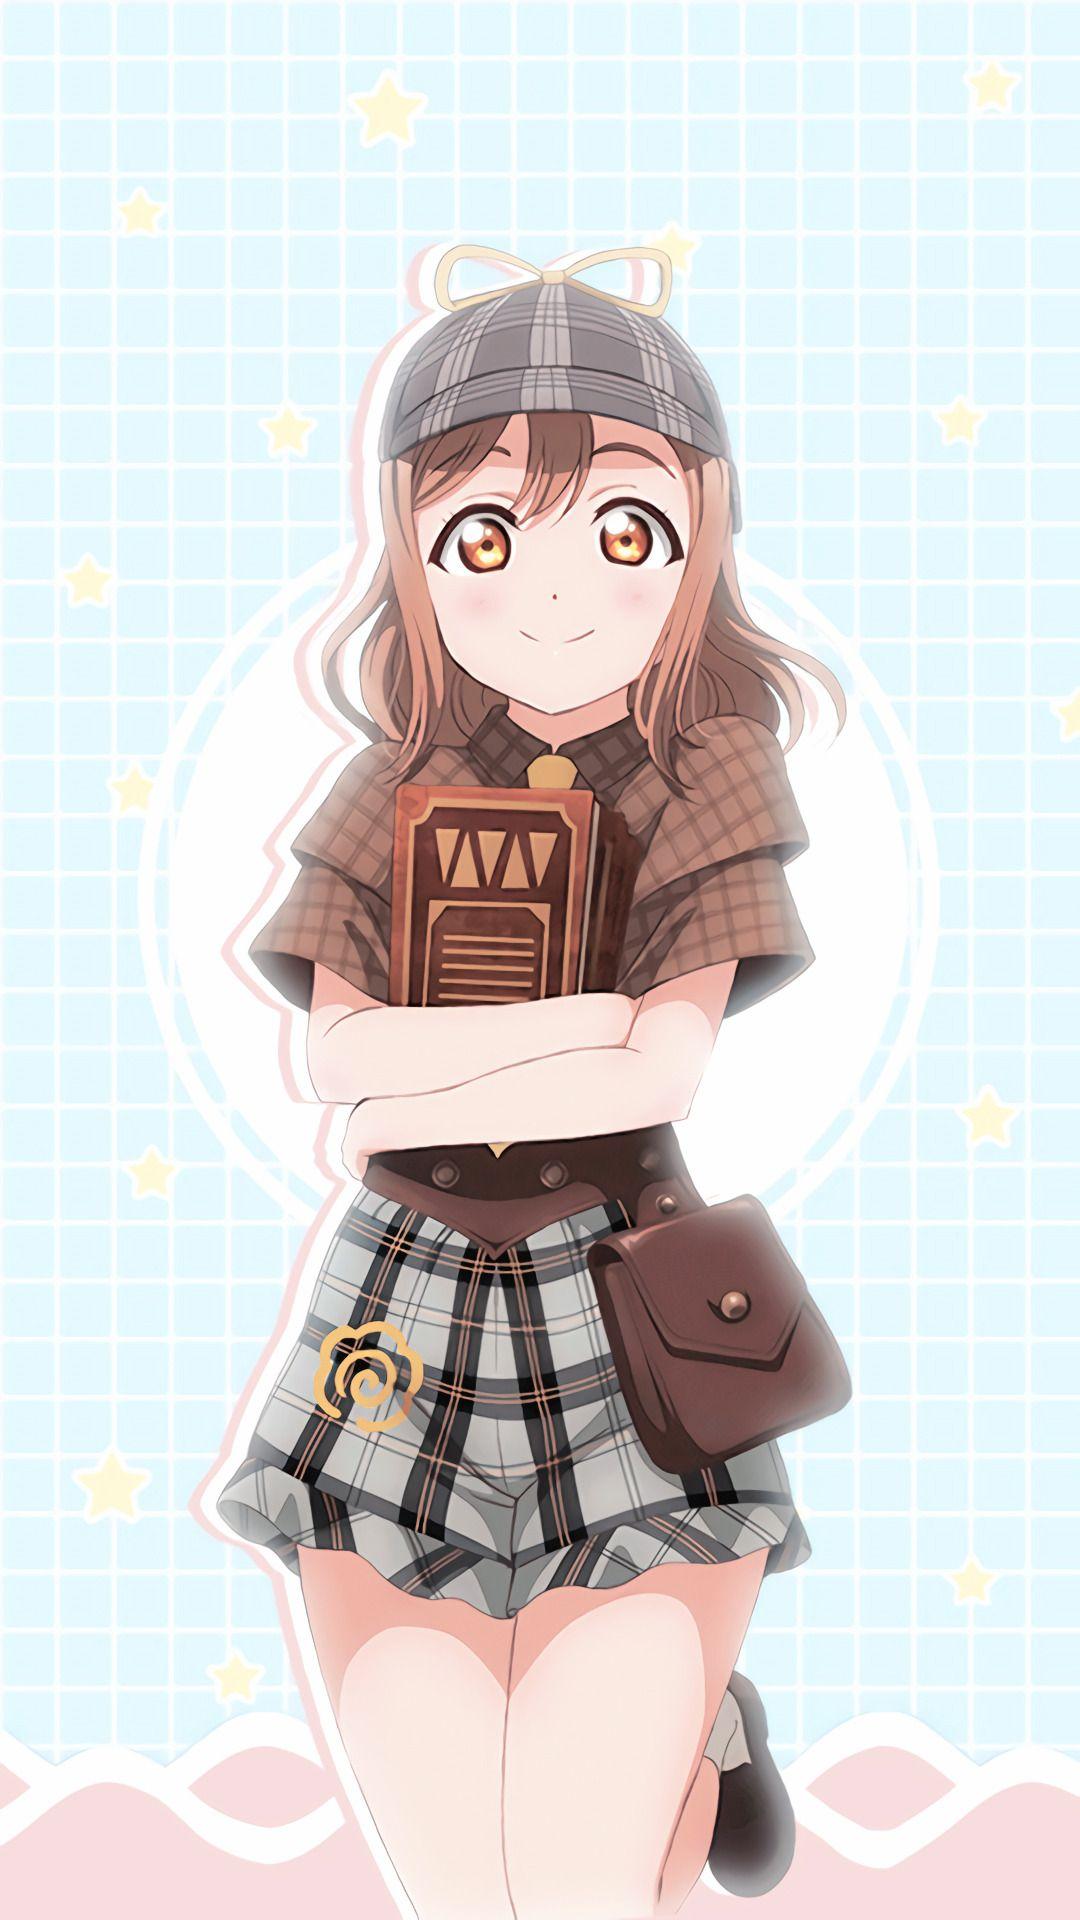 Tumblr virtual girl anime chibi manga anime anime art character design girl